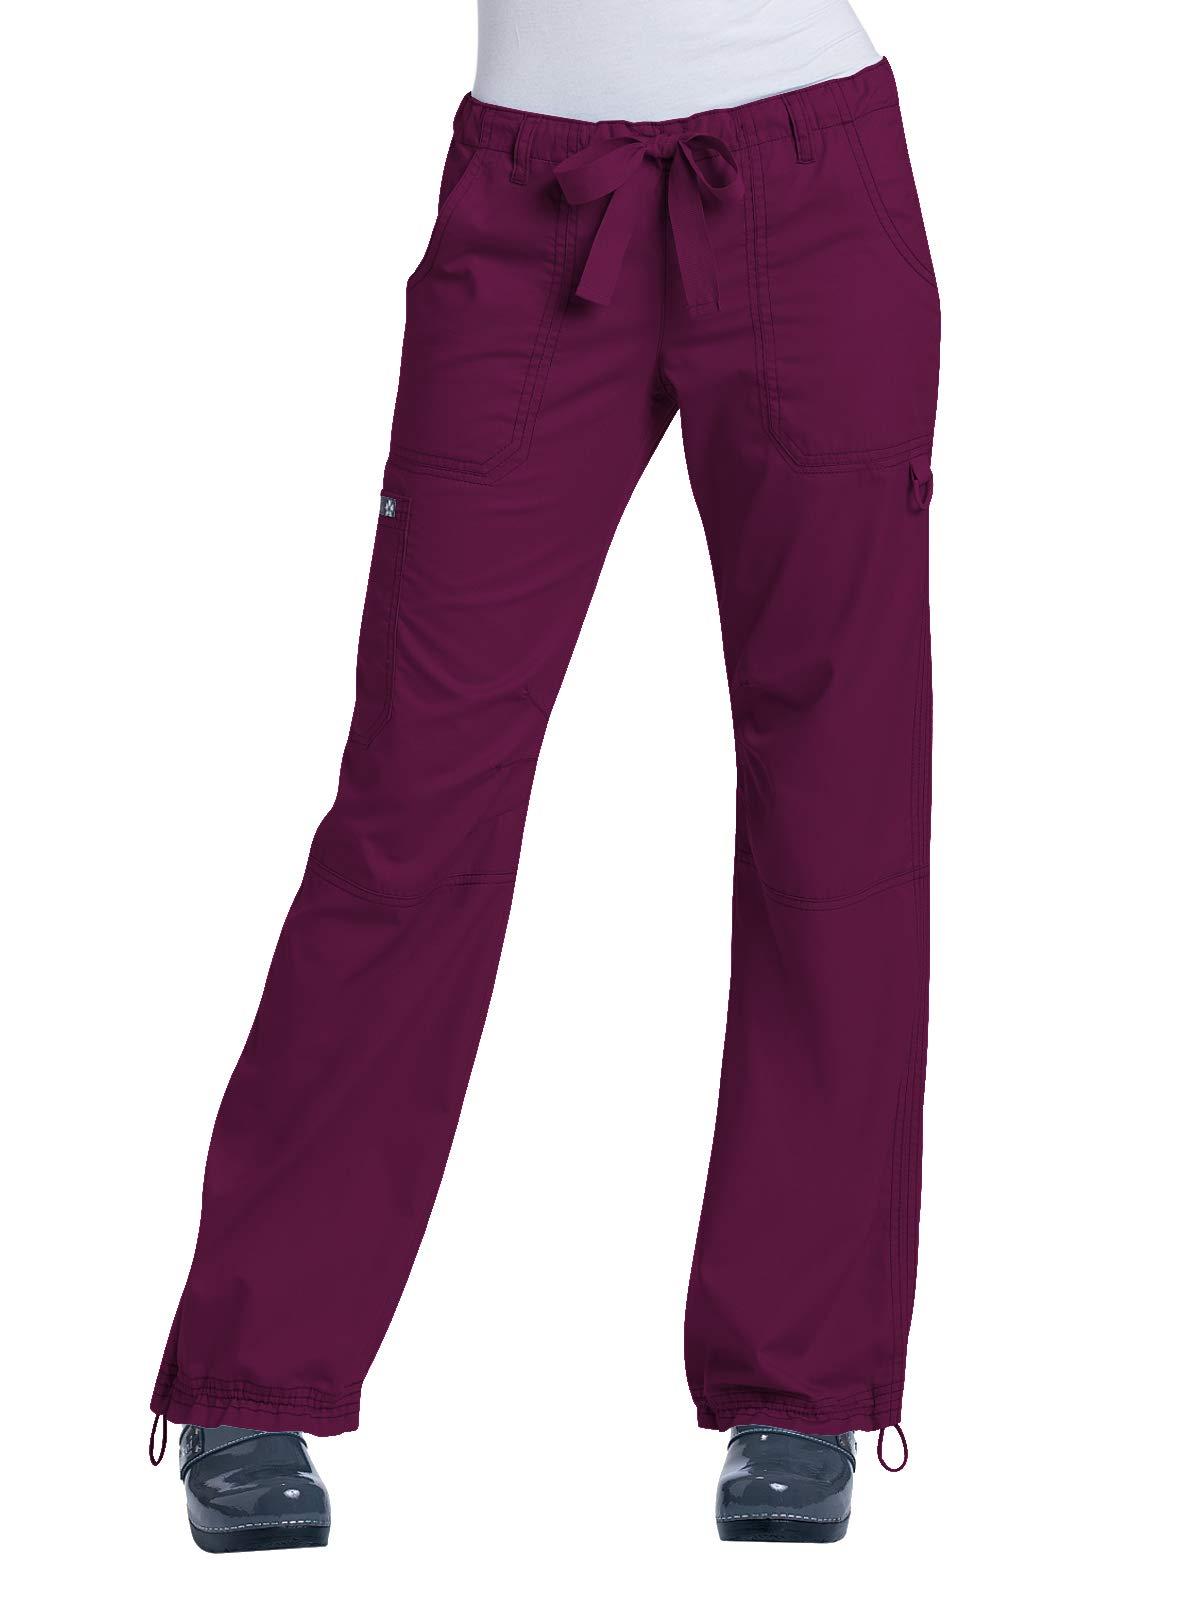 KOI Women's Lindsey Ultra Comfortable Cargo Style Scrub Pants (Tall Sizes), Wine, Large by KOI